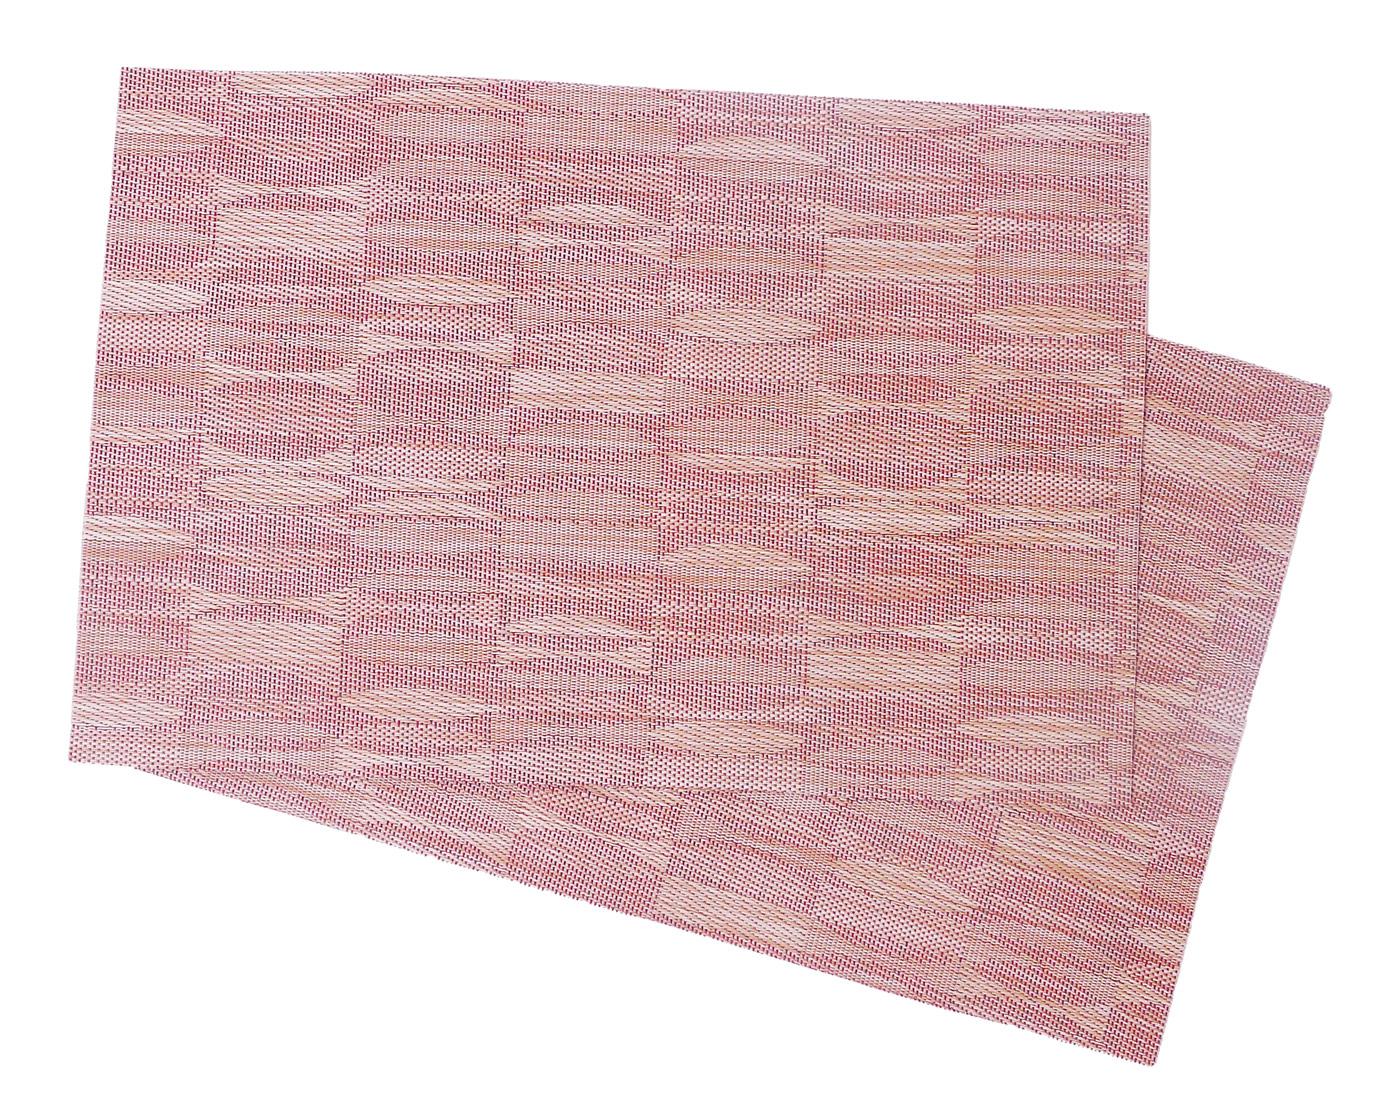 Image of Crossweave Woven Vinyl Placemat, Terrazo MAT27